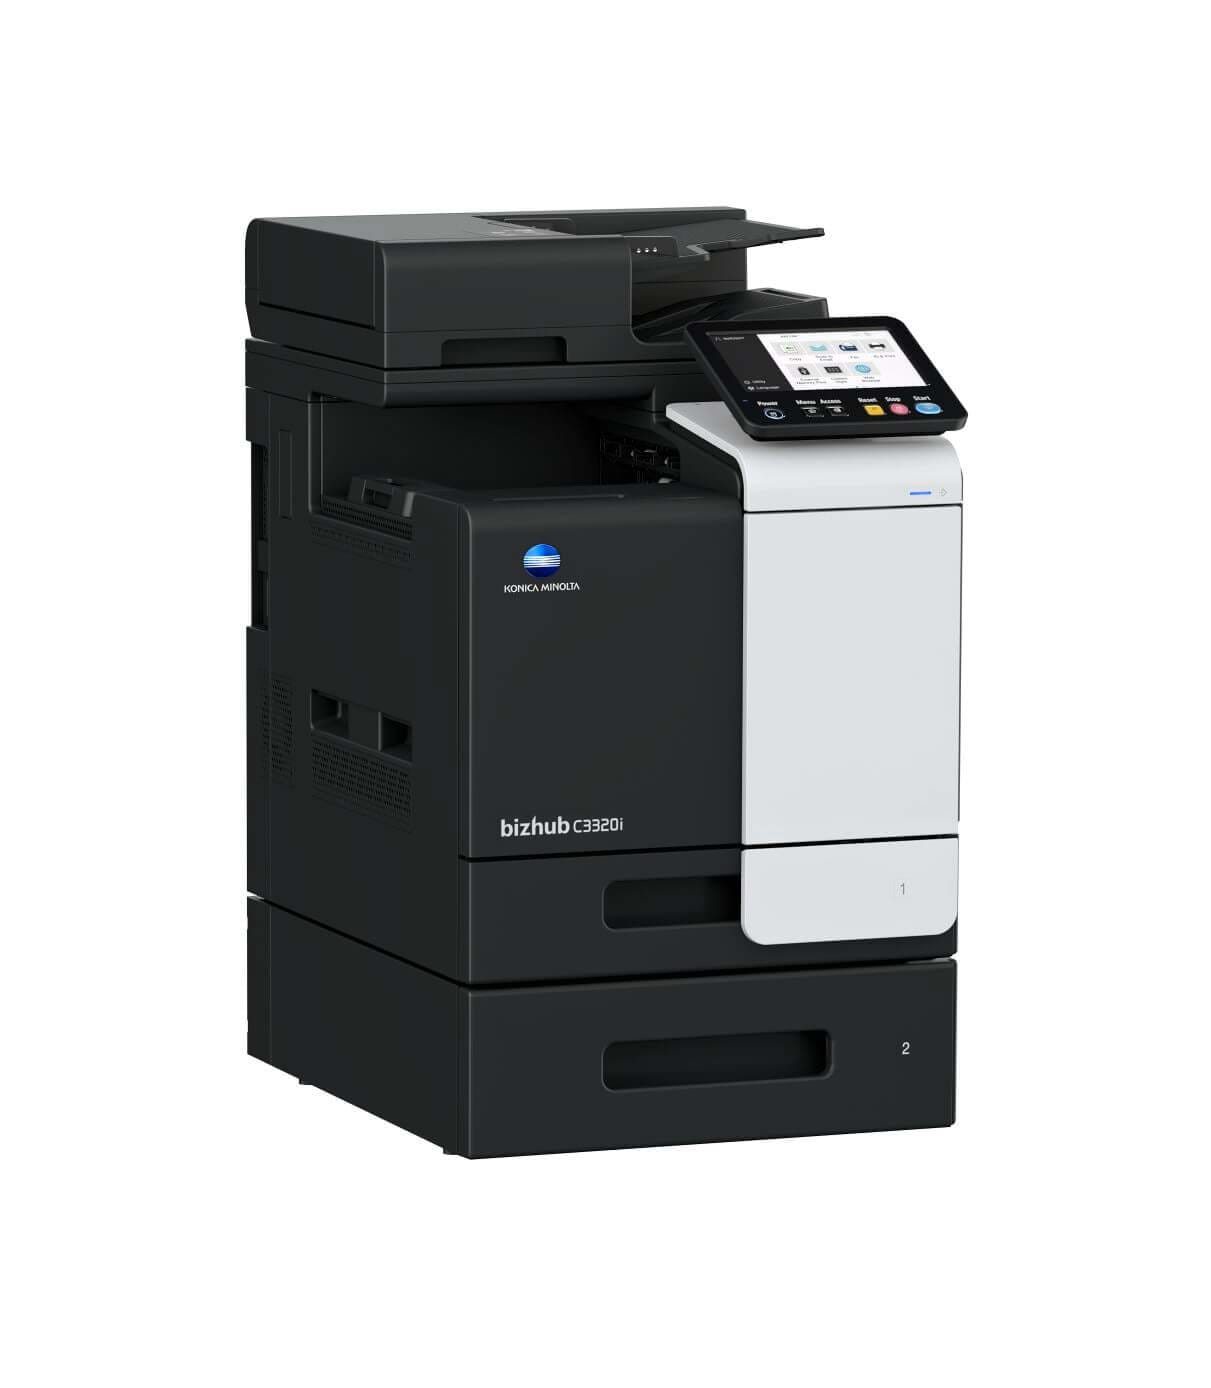 bizhub-C3320i-mdtech-kserokopiarka